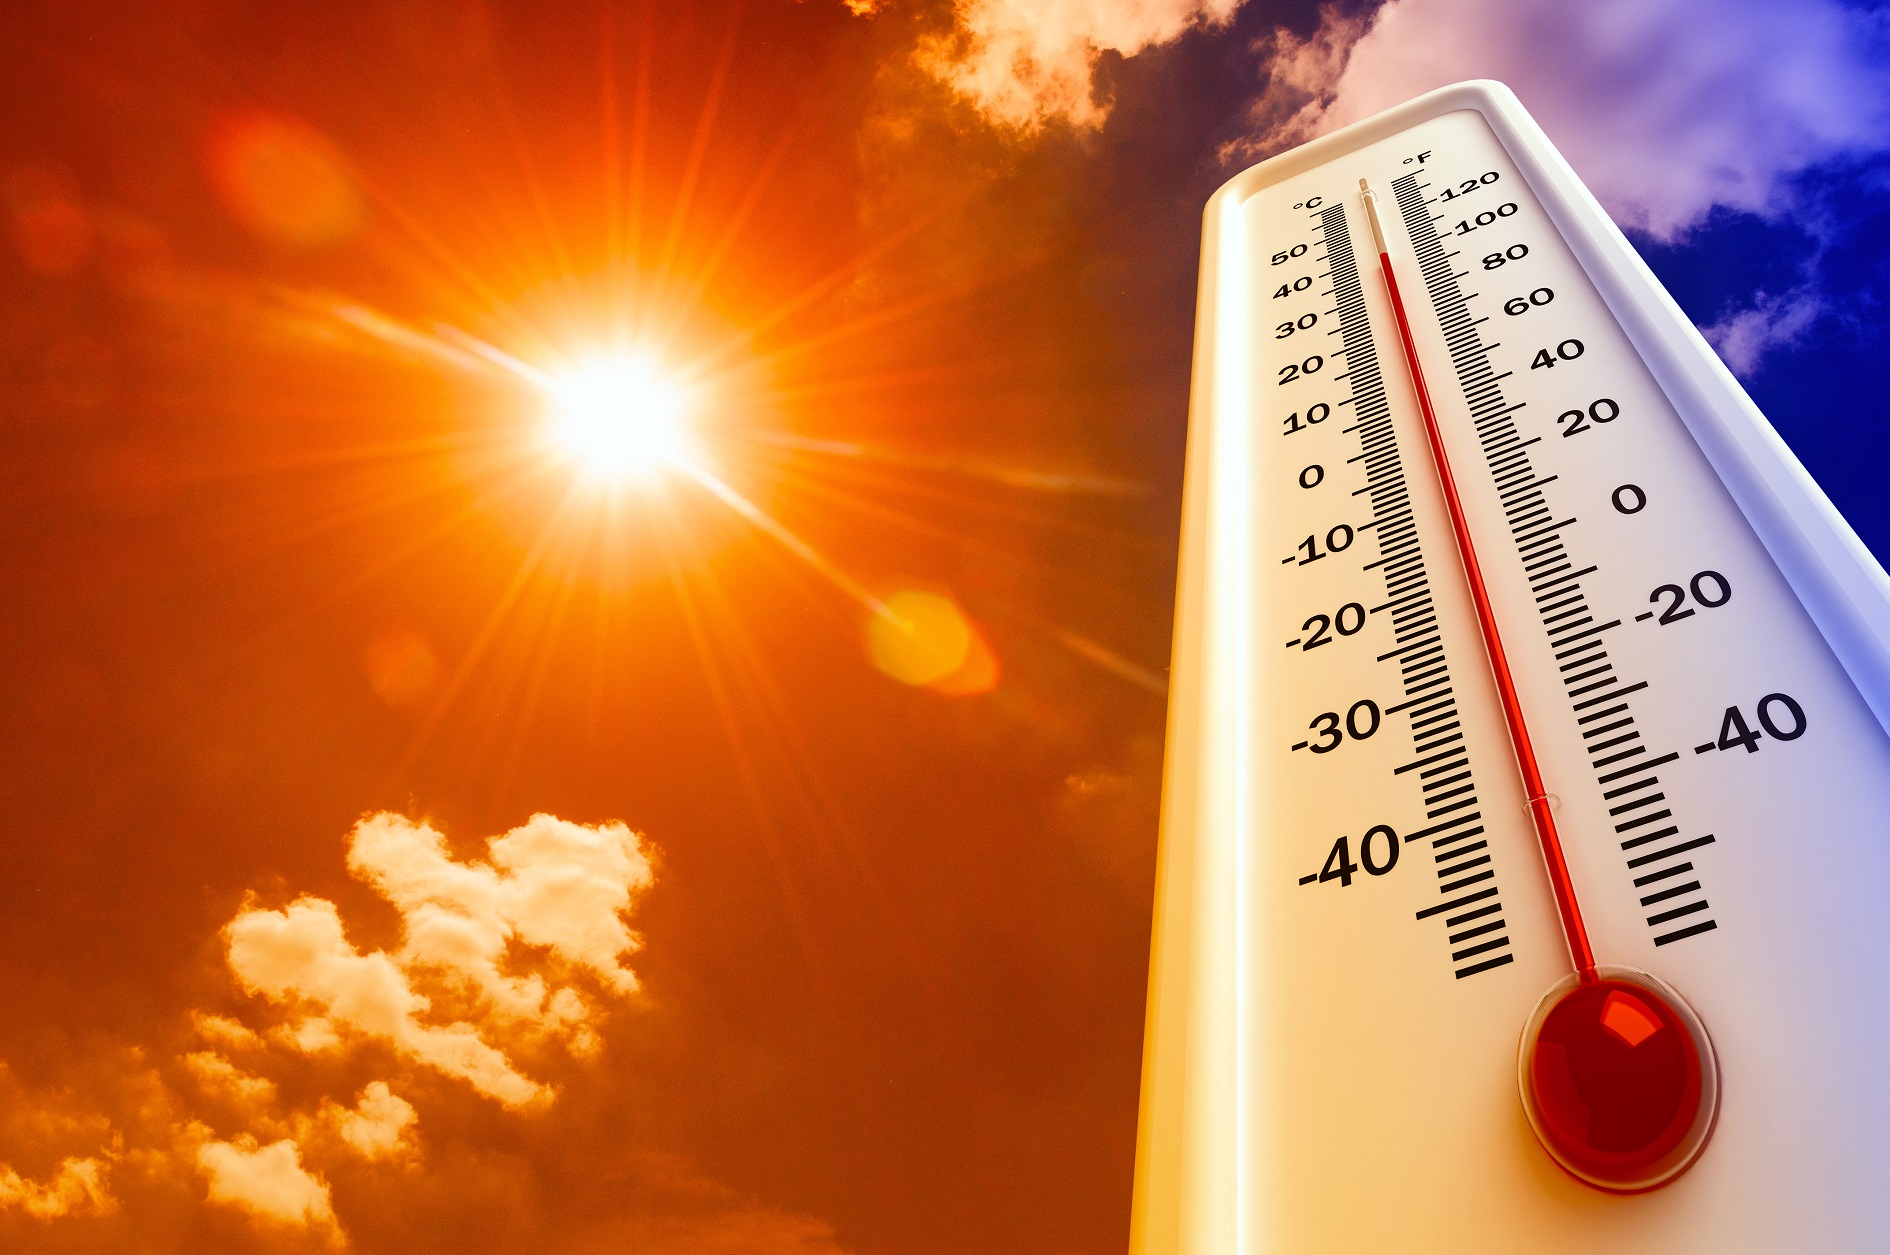 temperatuur kweekruimte buiten